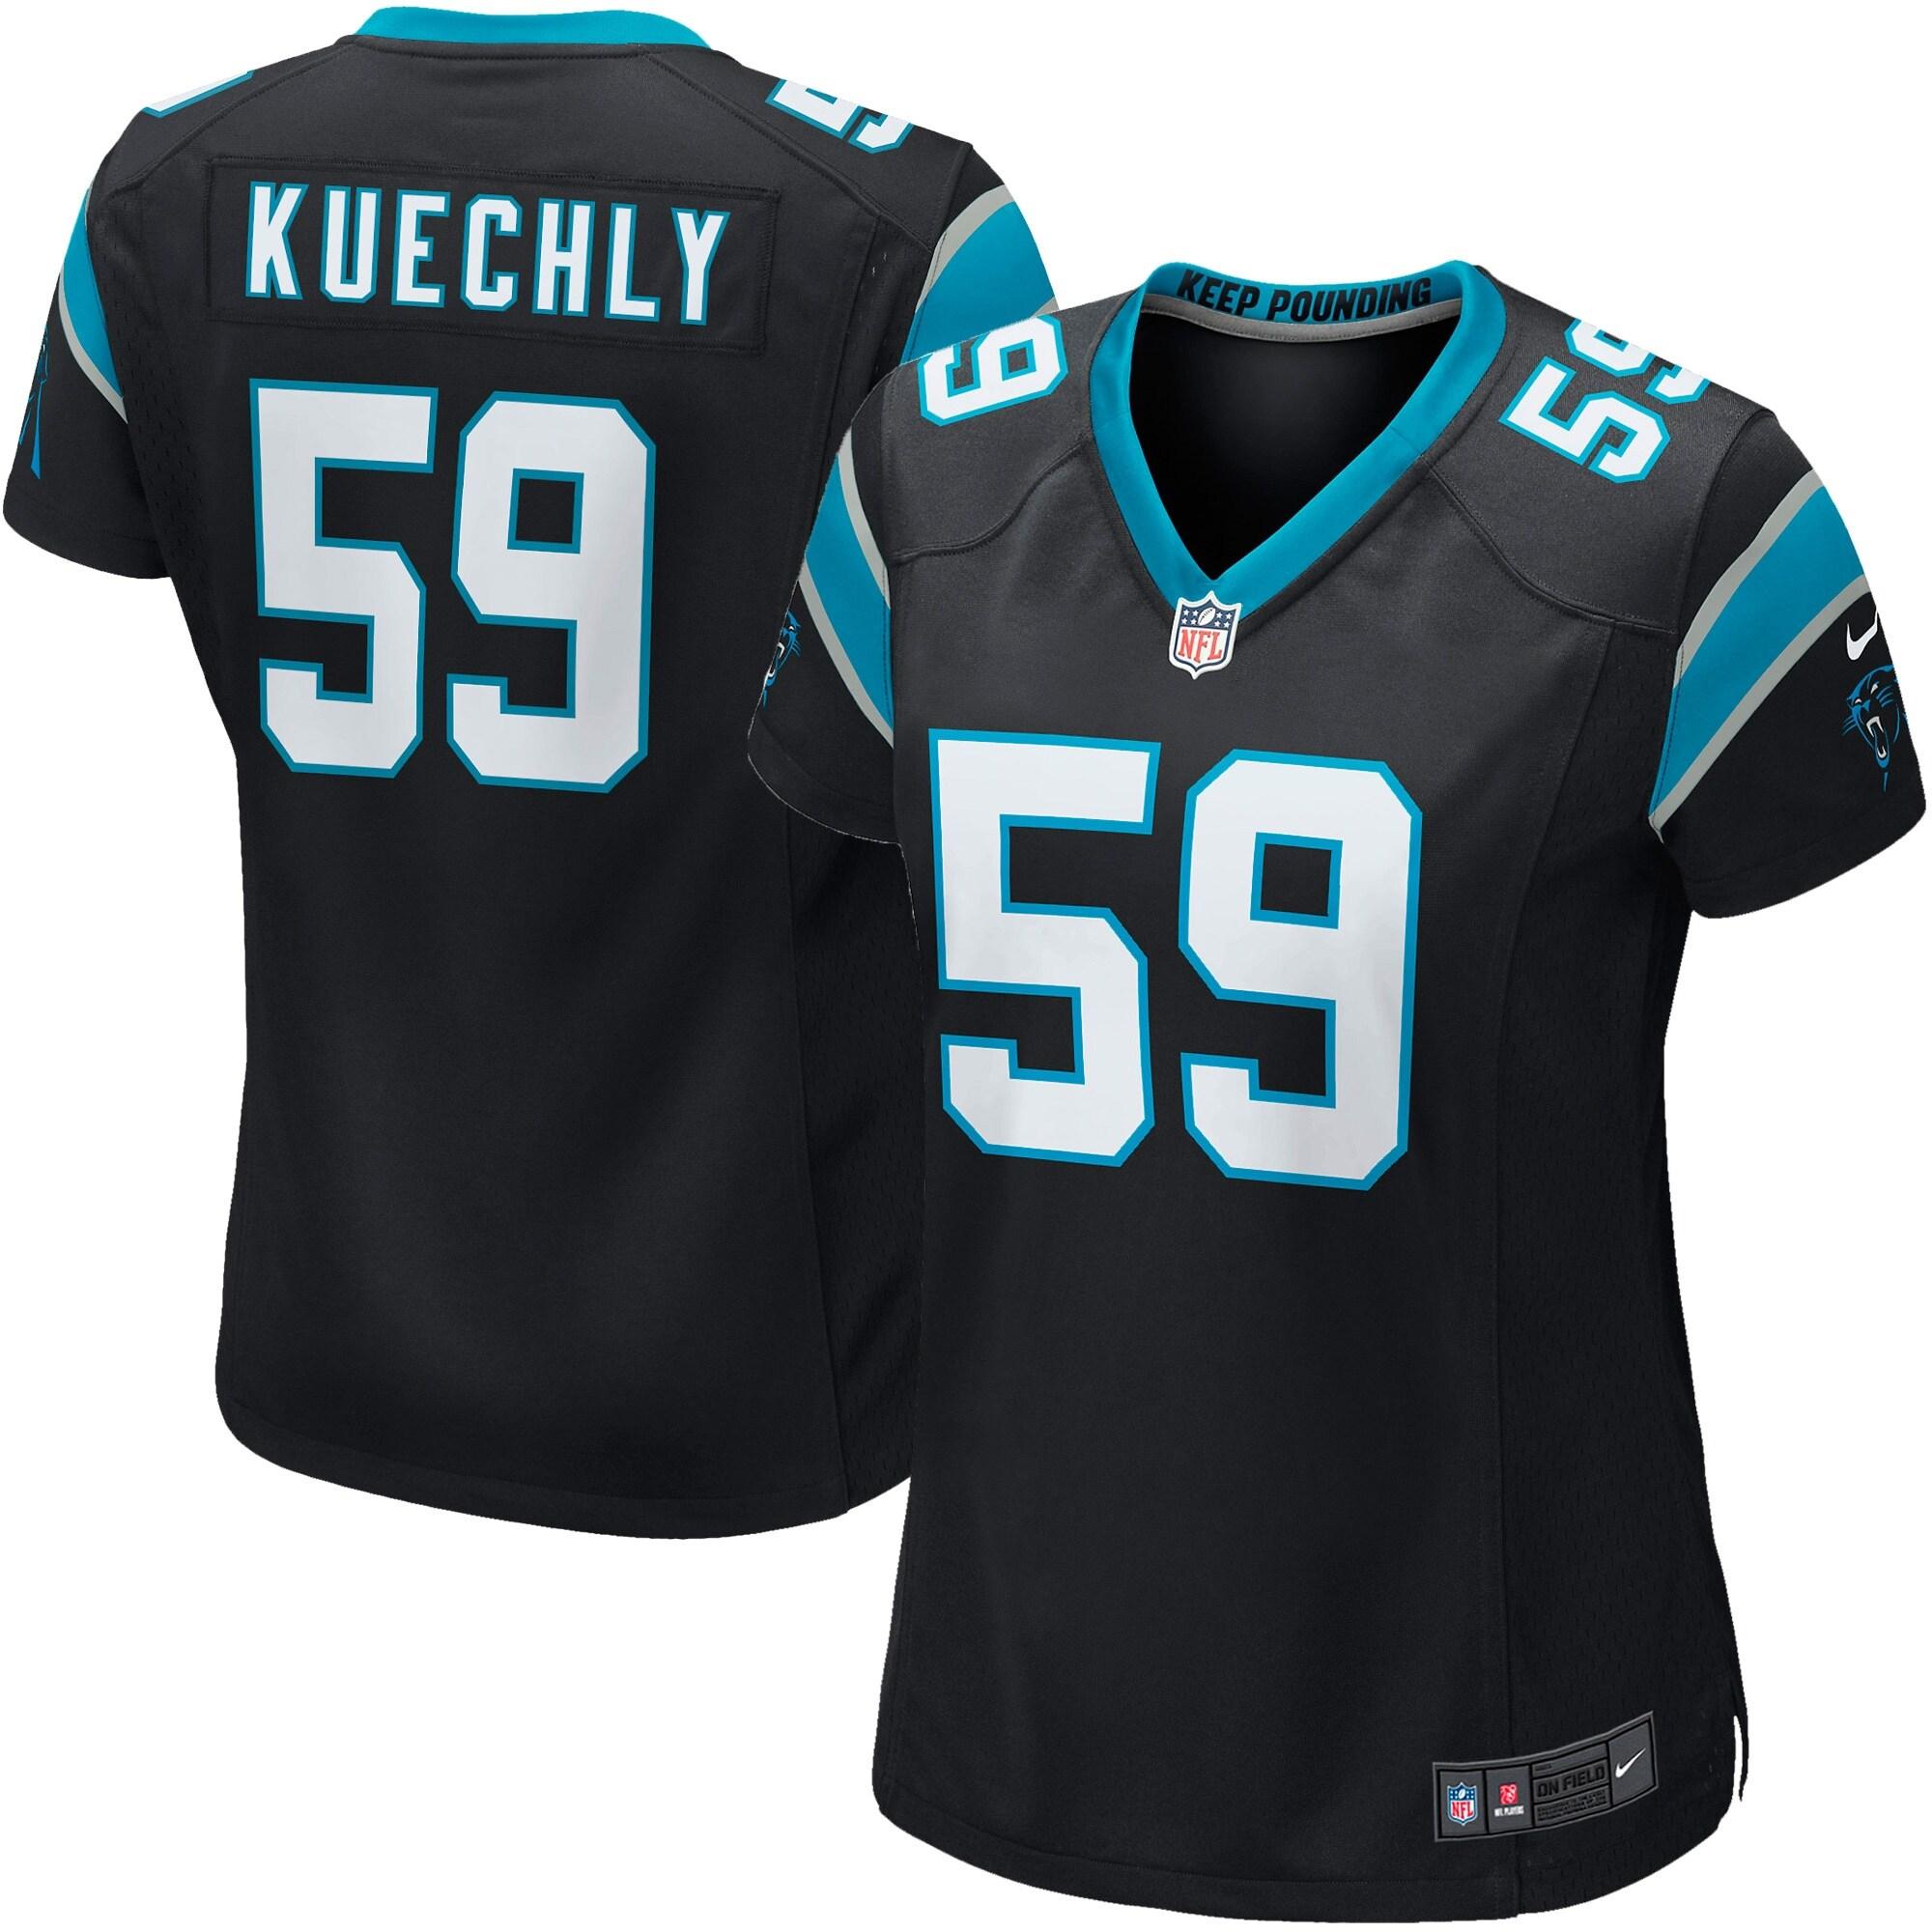 Luke Kuechly Carolina Panthers Nike Girls Youth Game Jersey - Black